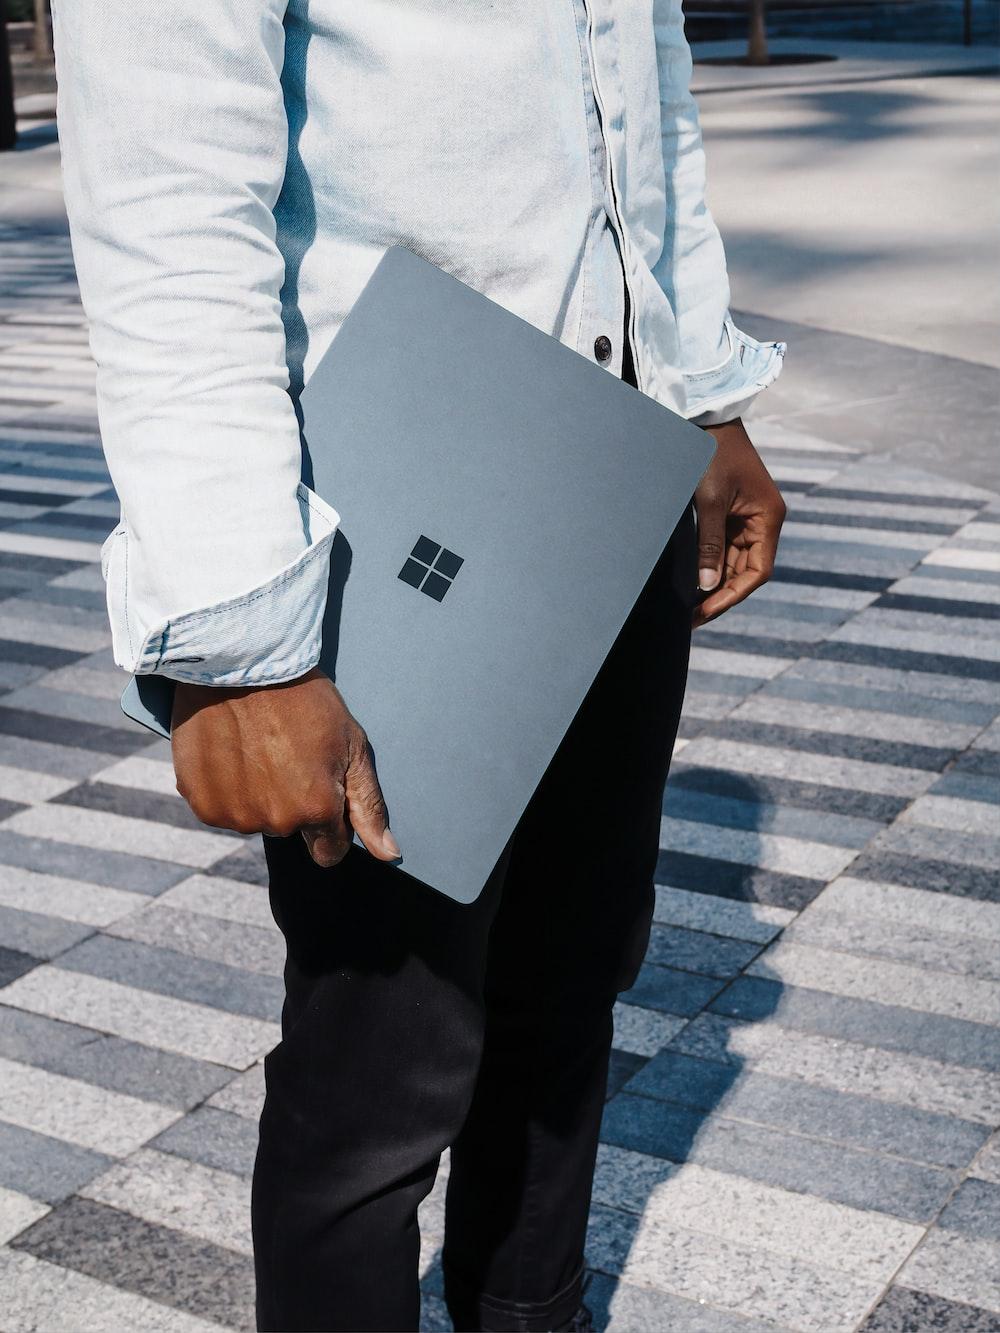 man in dress shirt holding blue microsoft surface laptop computer